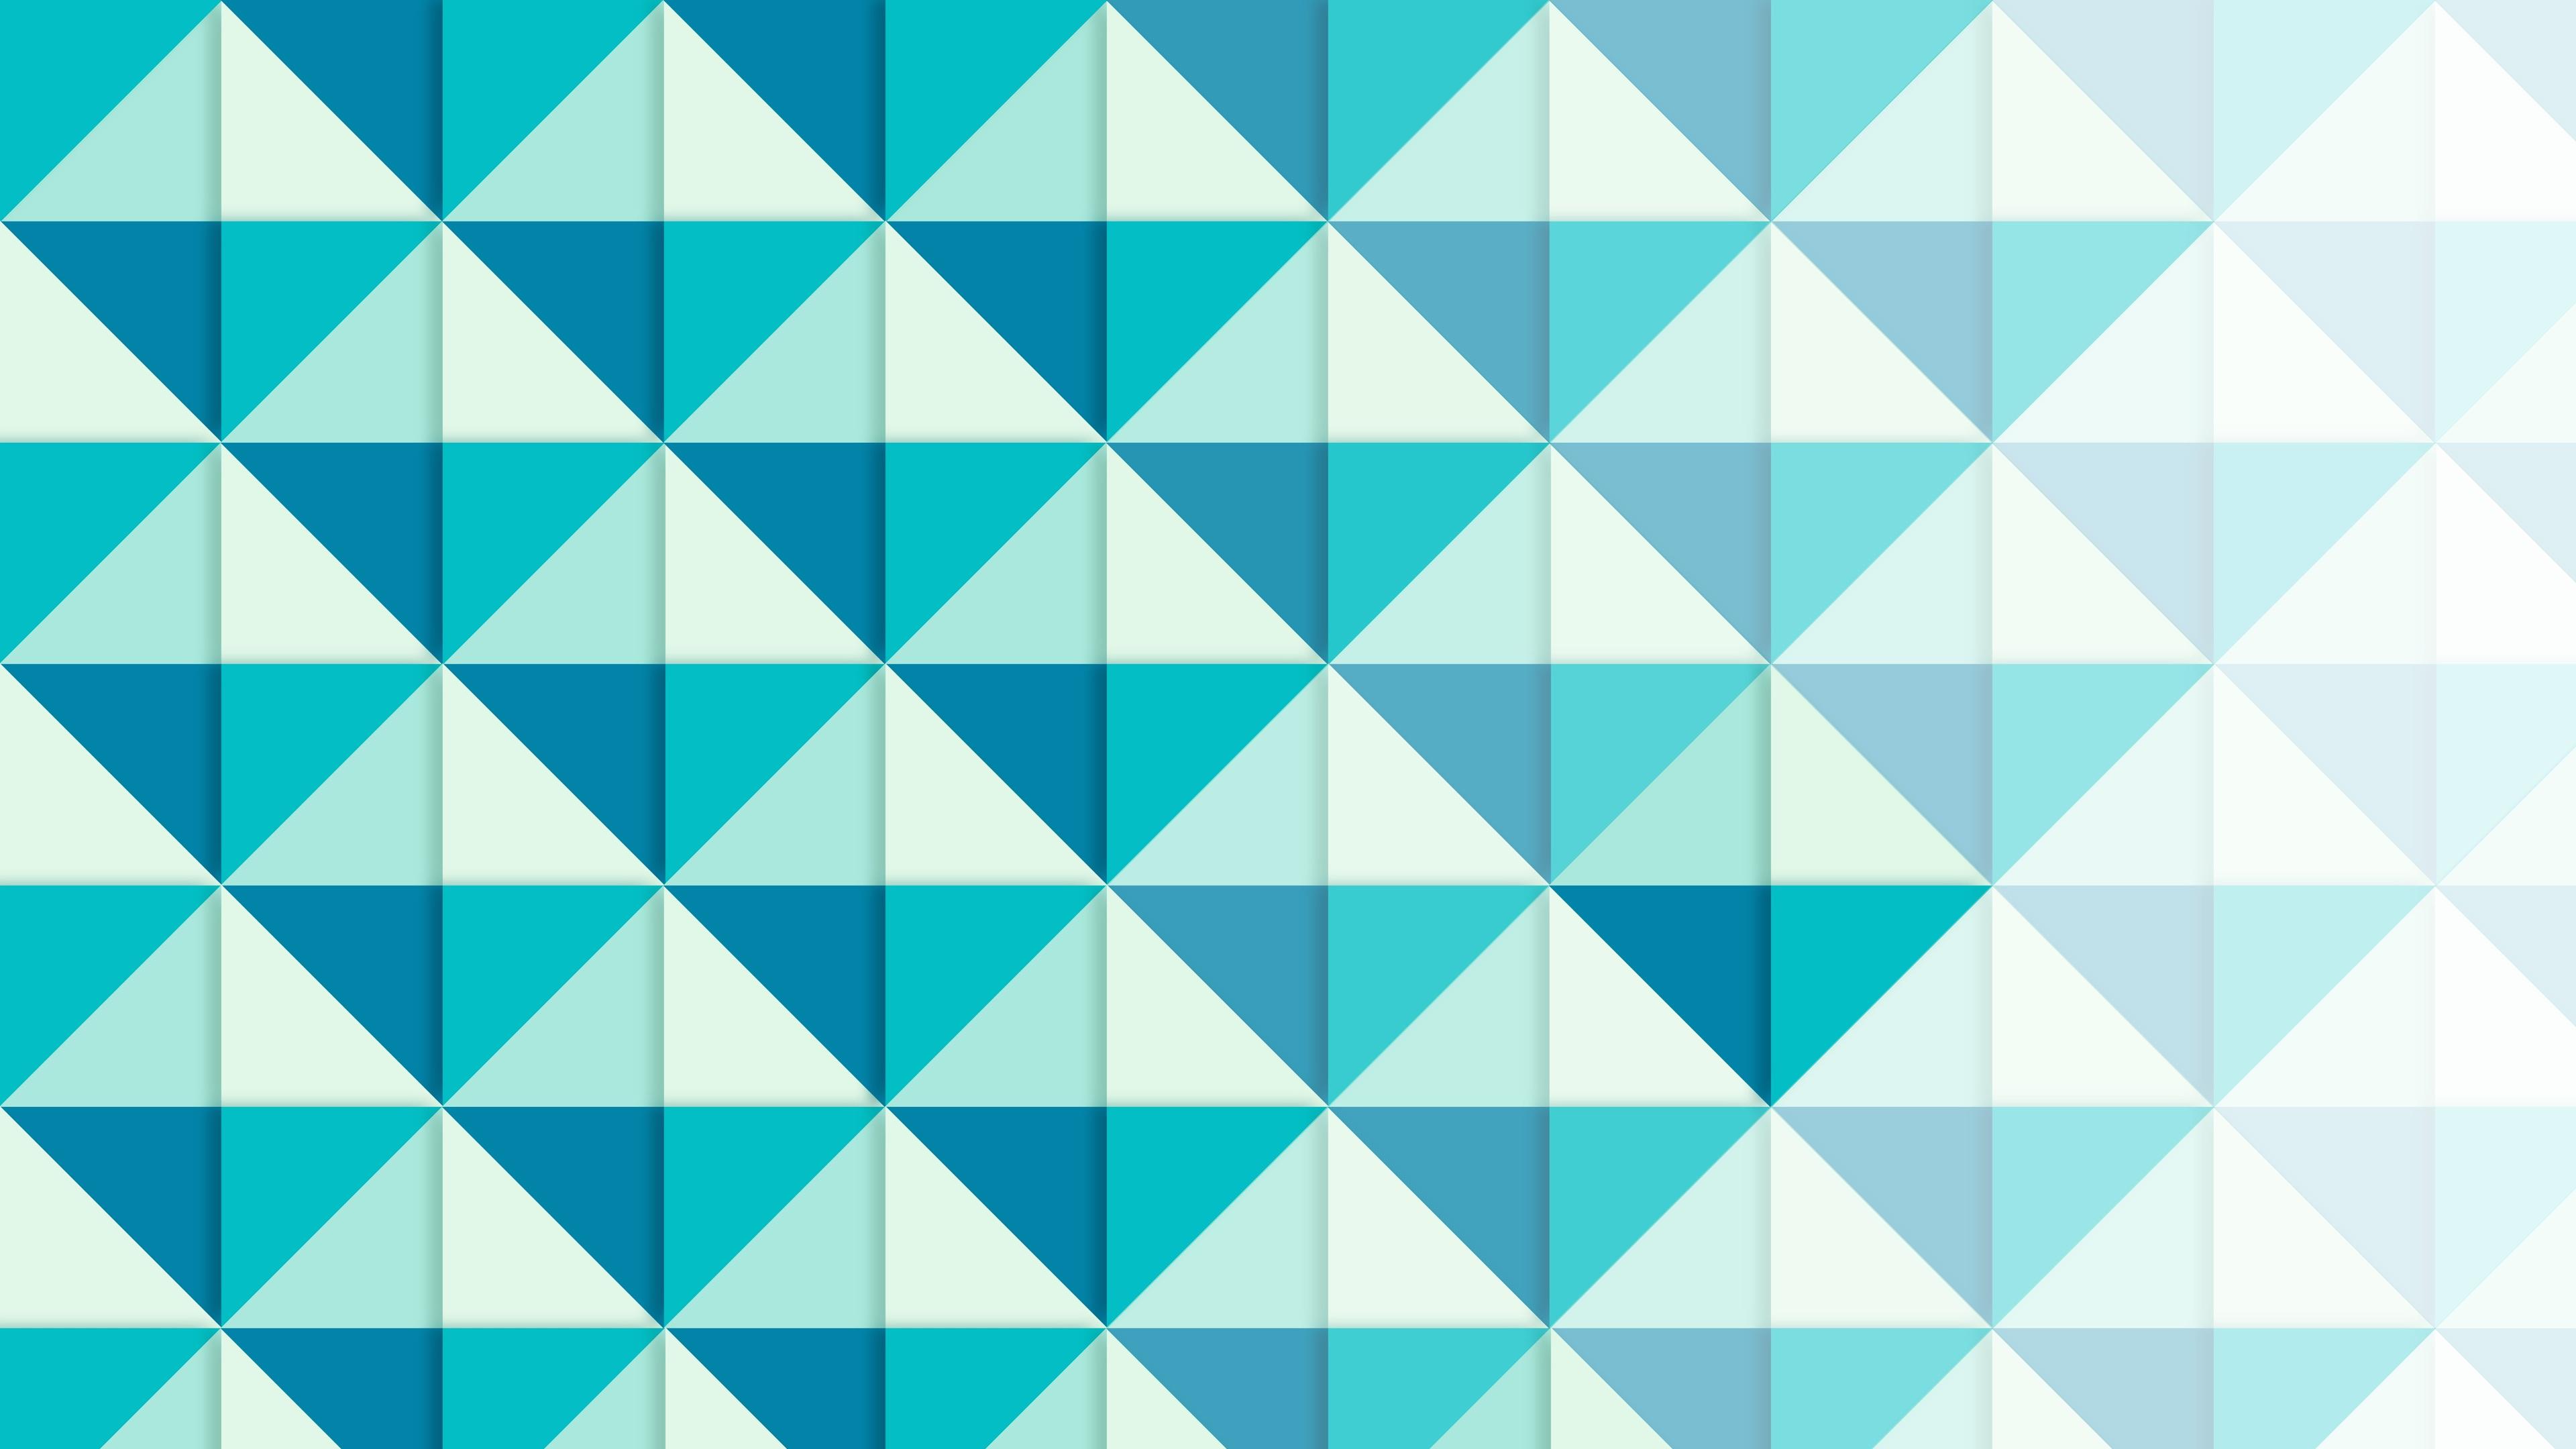 background geometric design backdrop texture 1539370981 - Background Geometric Design Backdrop Texture - texture wallpapers, hd-wallpapers, geometry wallpapers, design wallpapers, abstract wallpapers, 8k wallpapers, 5k wallpapers, 4k-wallpapers